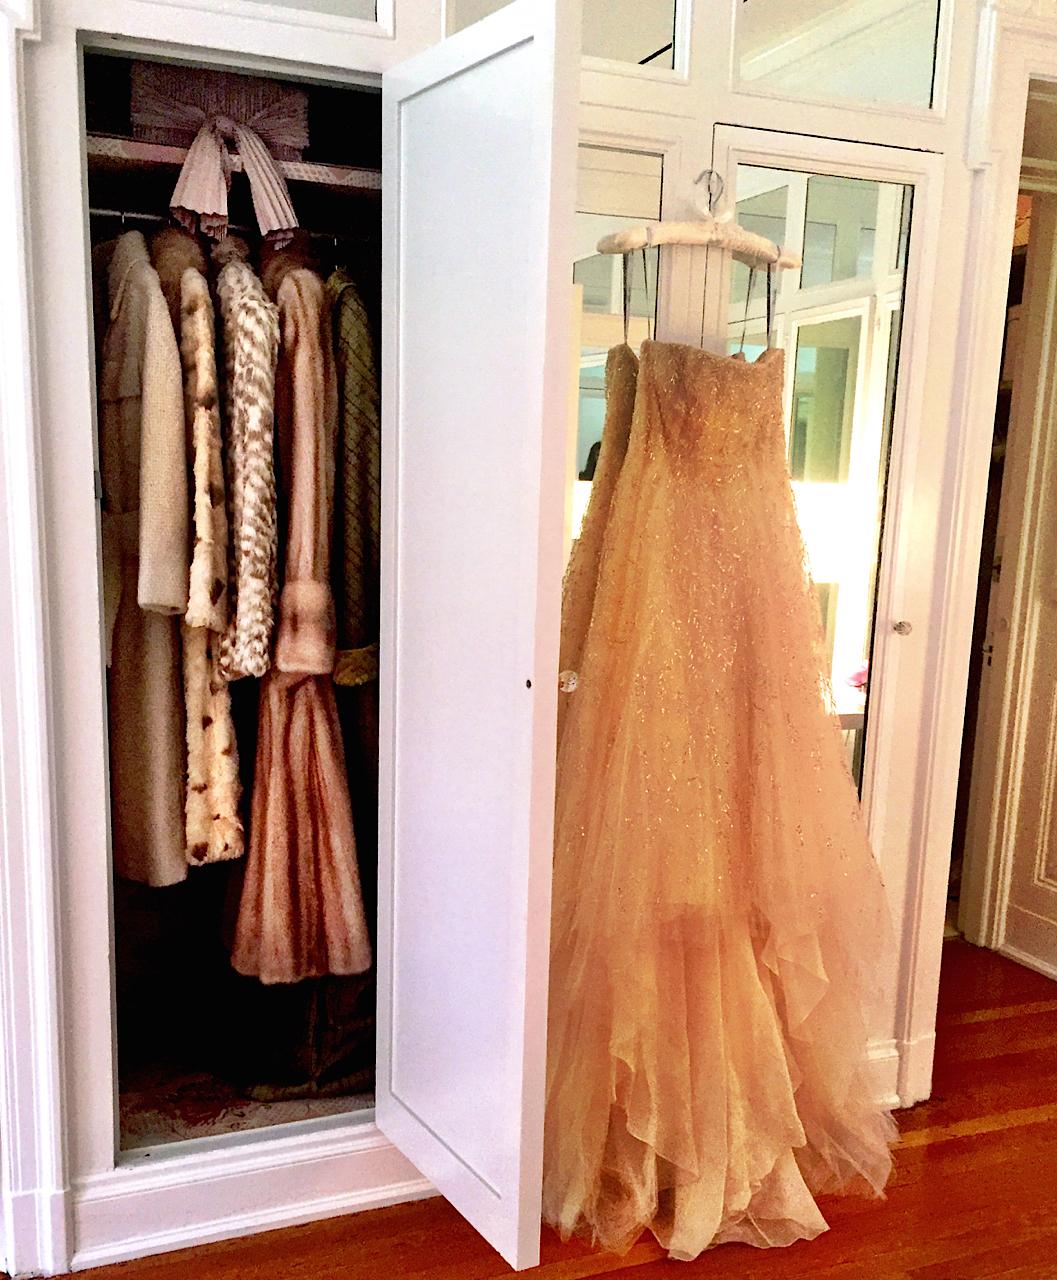 LA Closet at Greystone